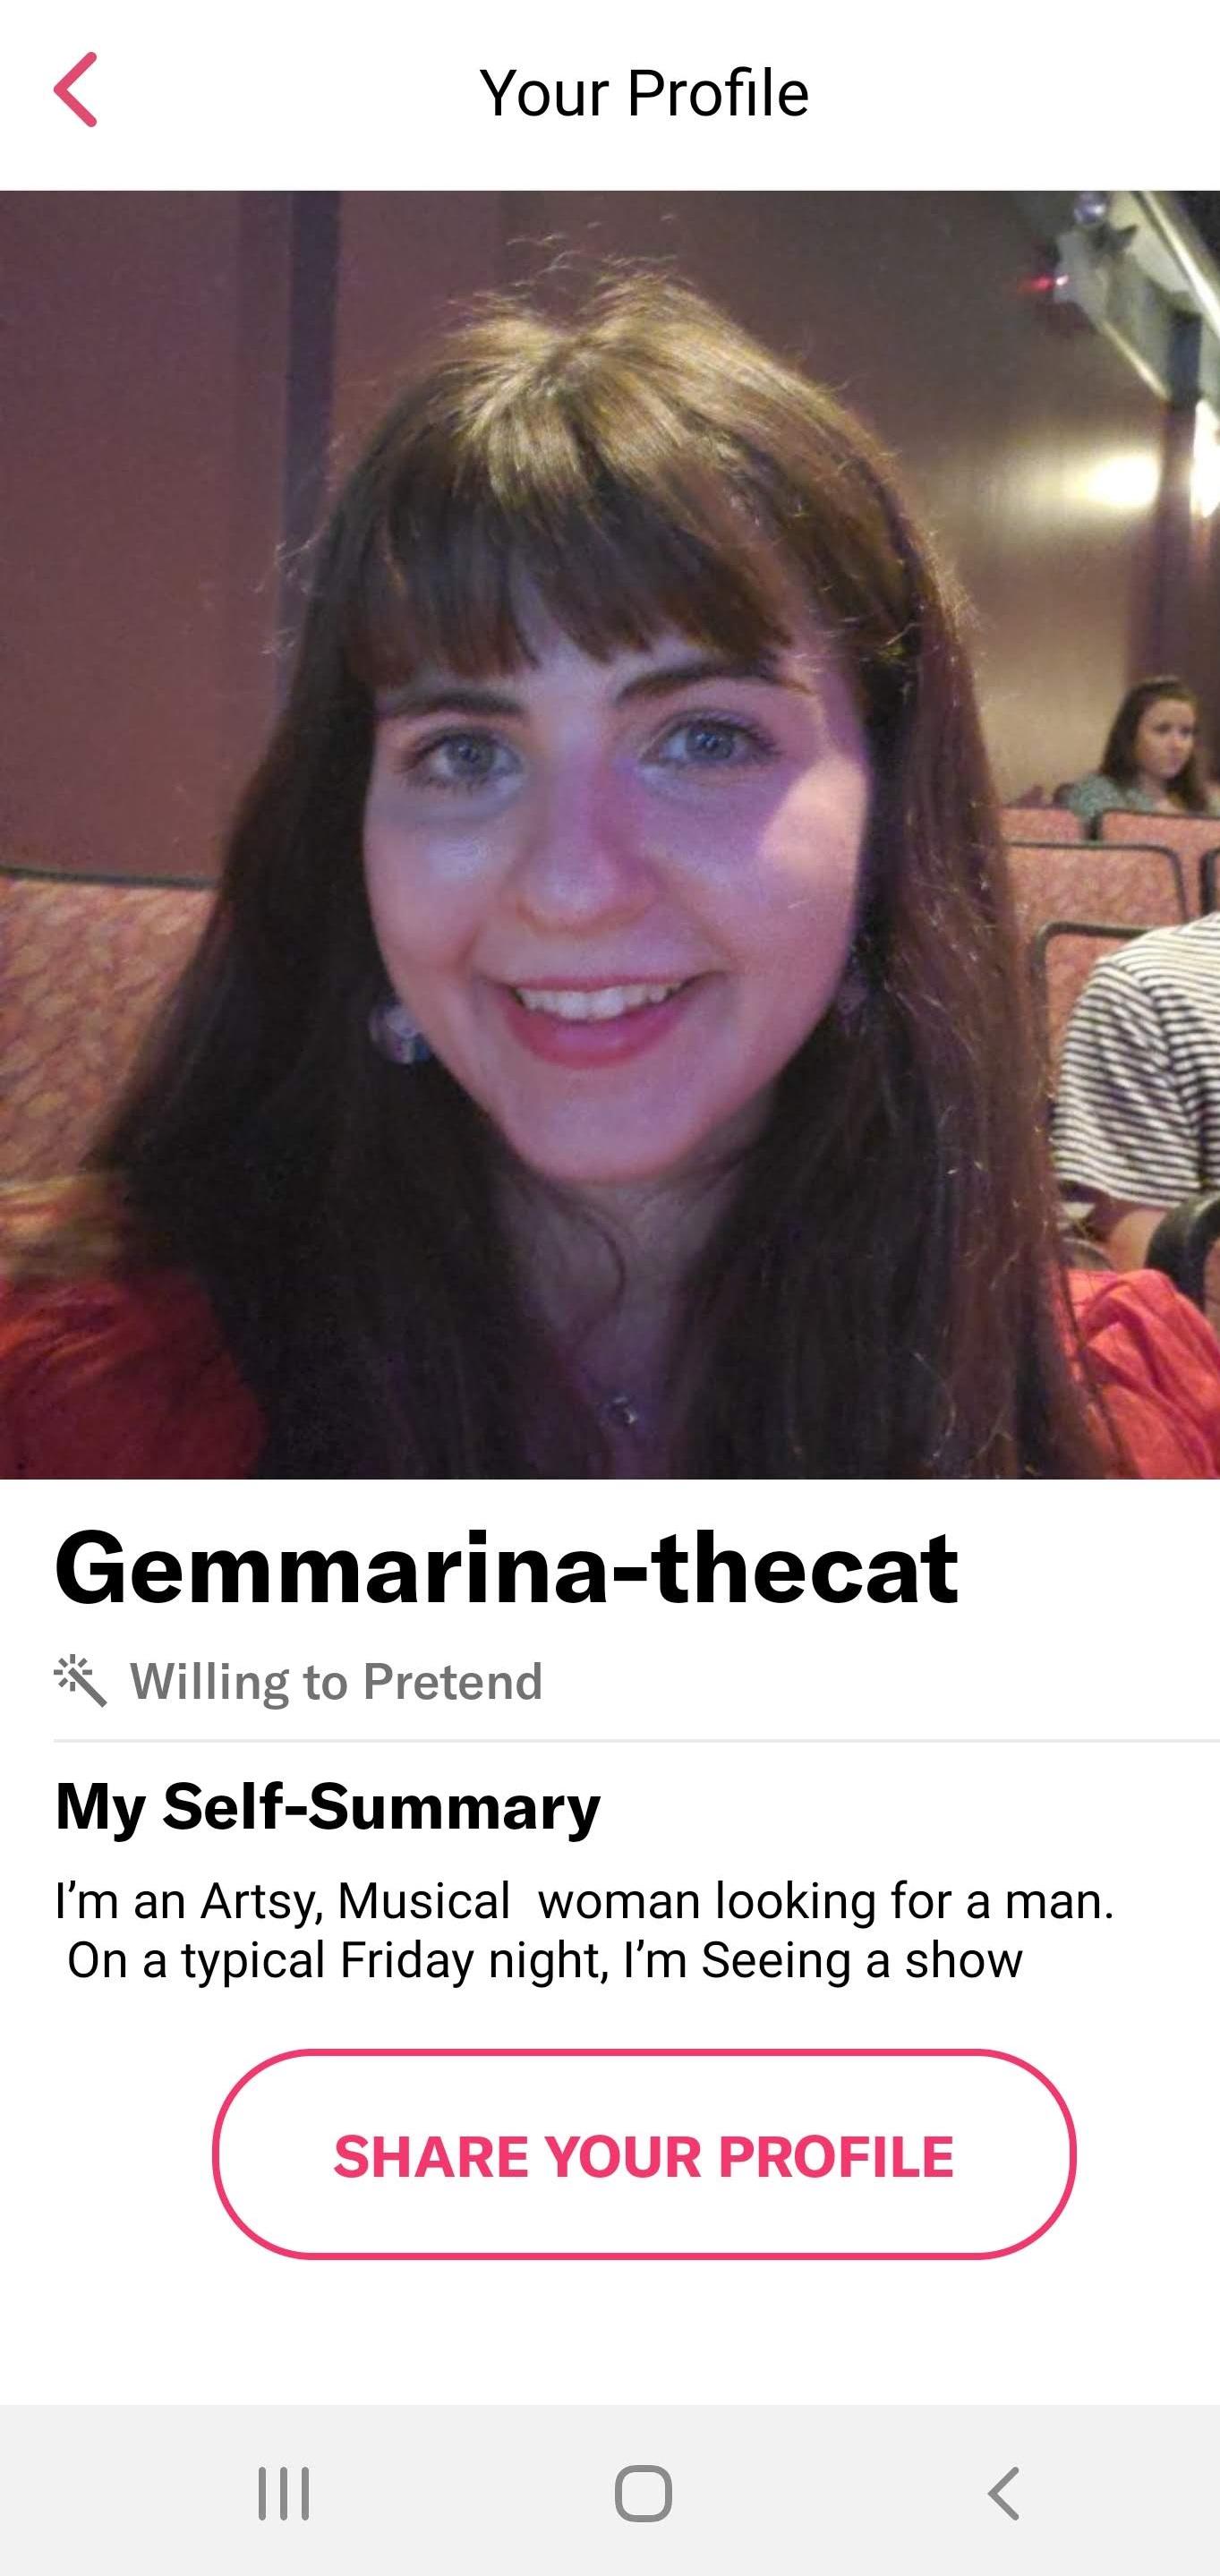 My profile on the #DateMe show app